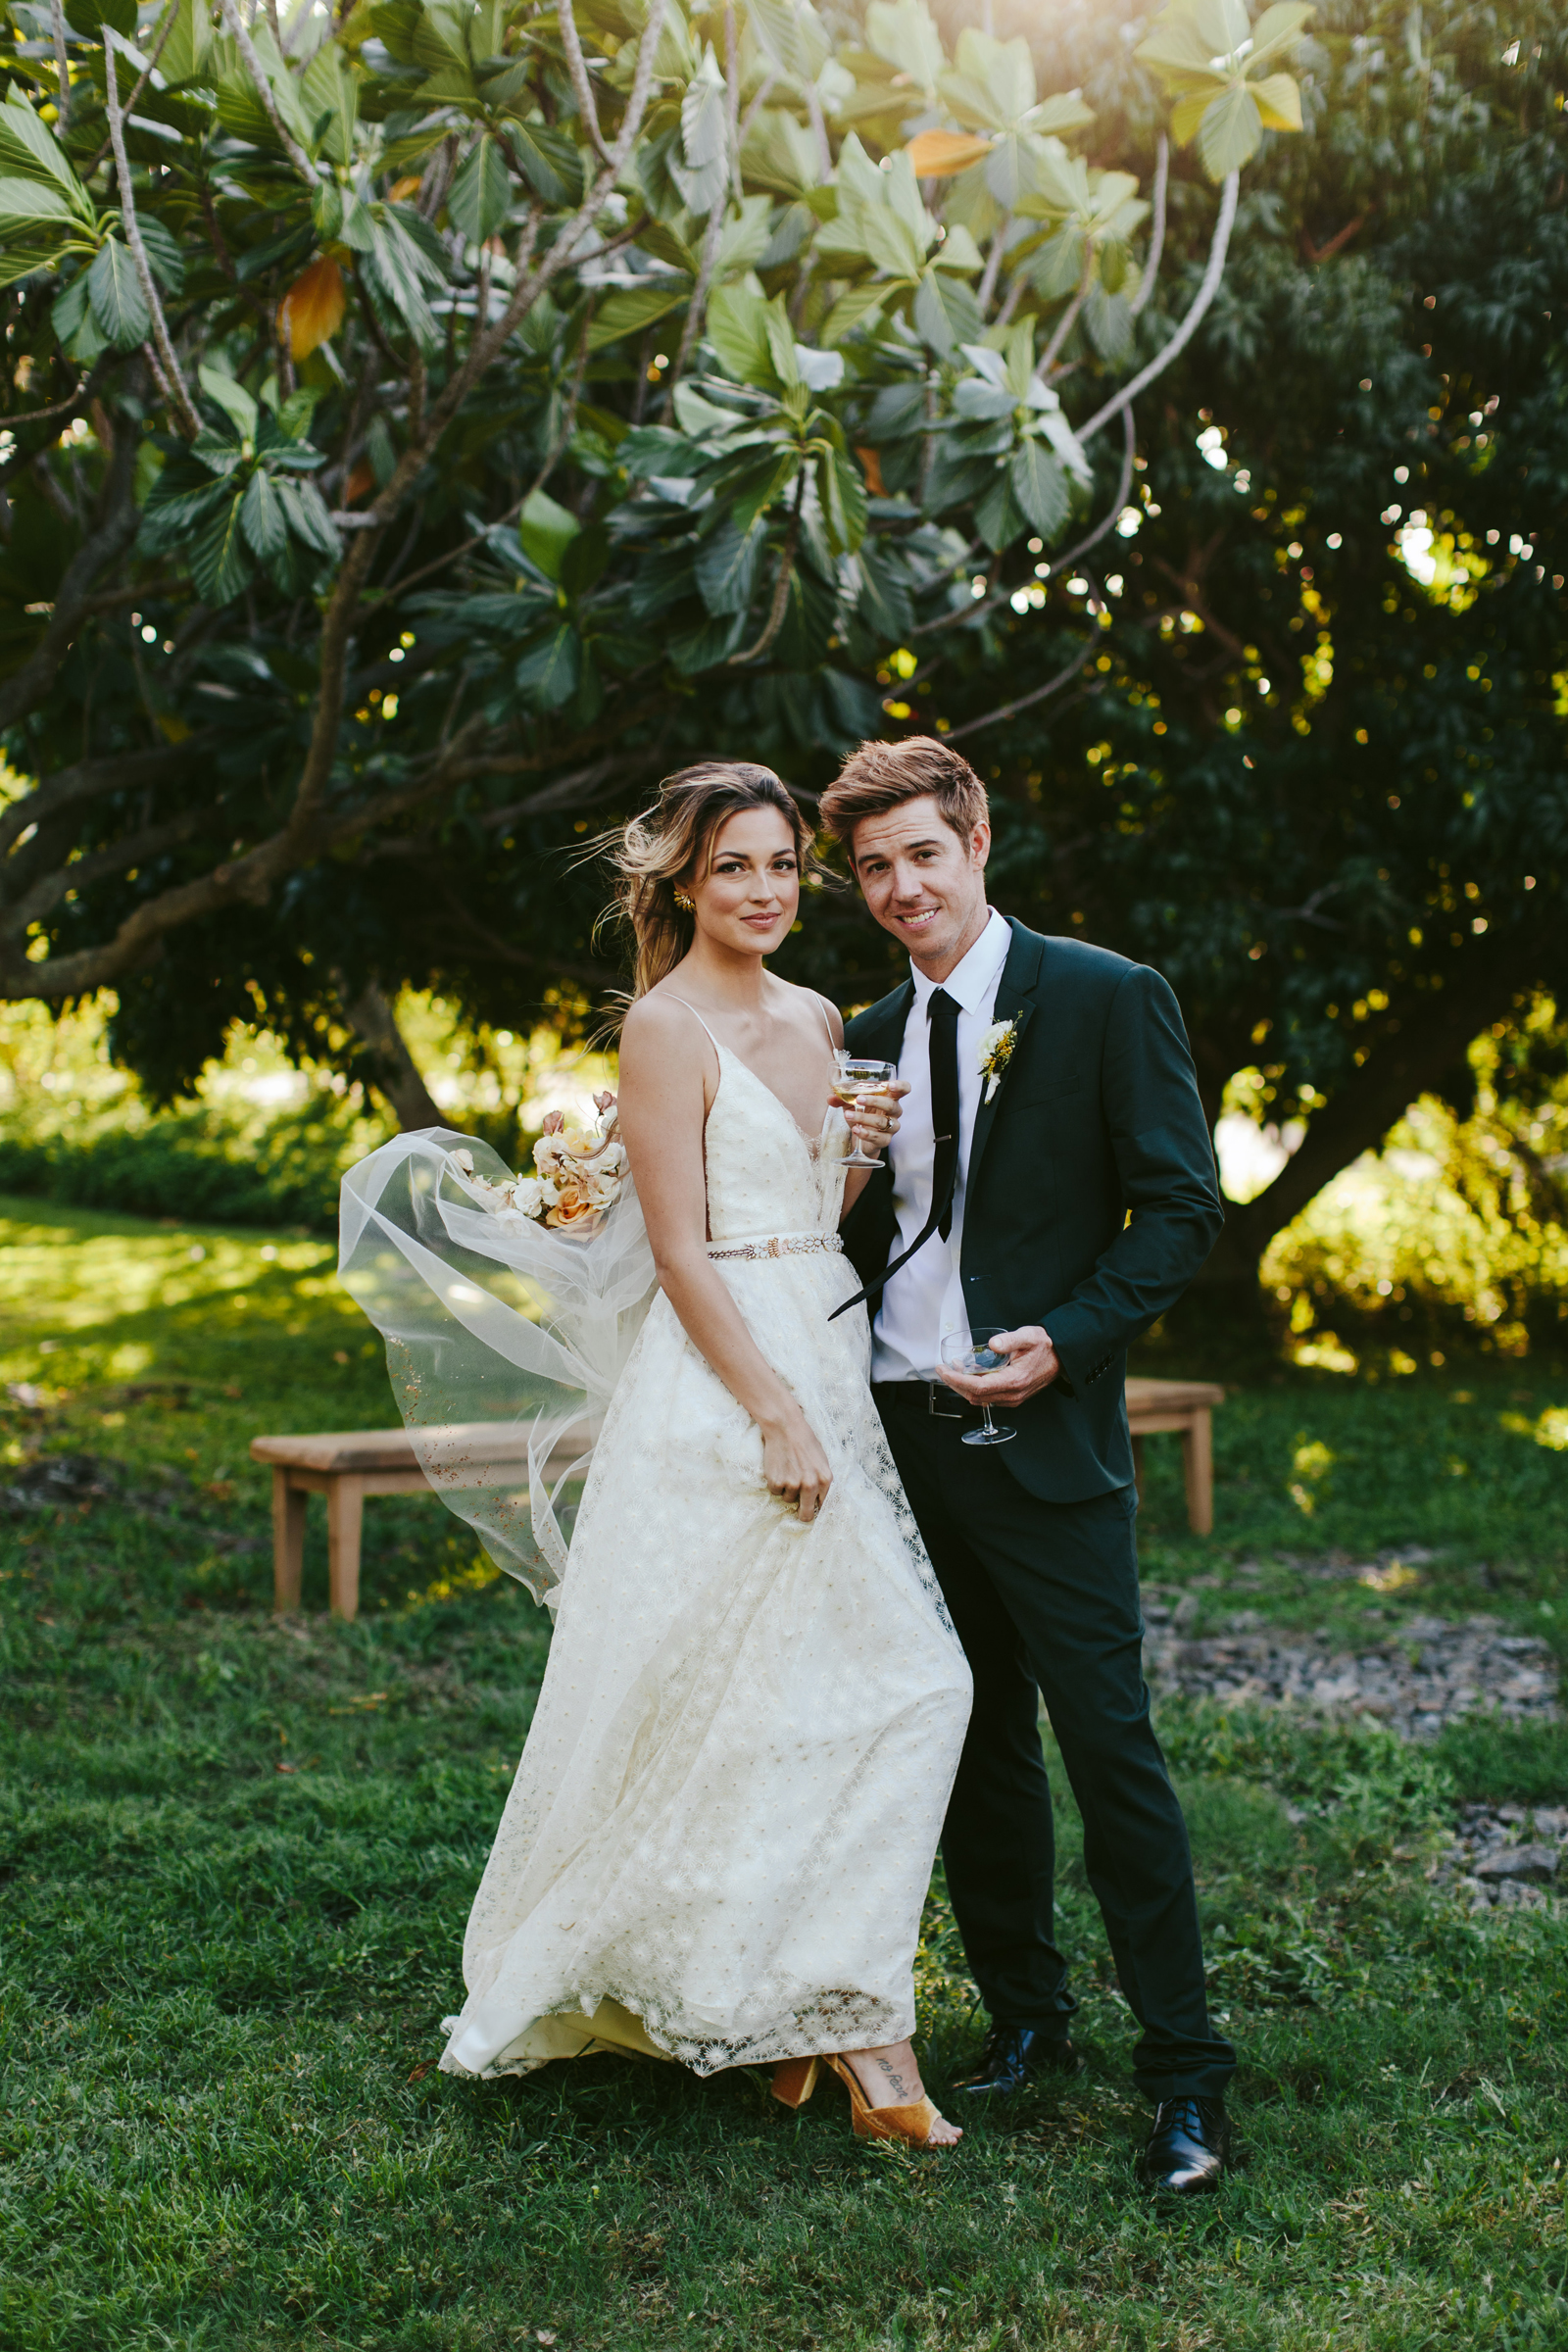 Hotel Wailea Maui bride and groom in garden breeze  - photo by Melia Lucida